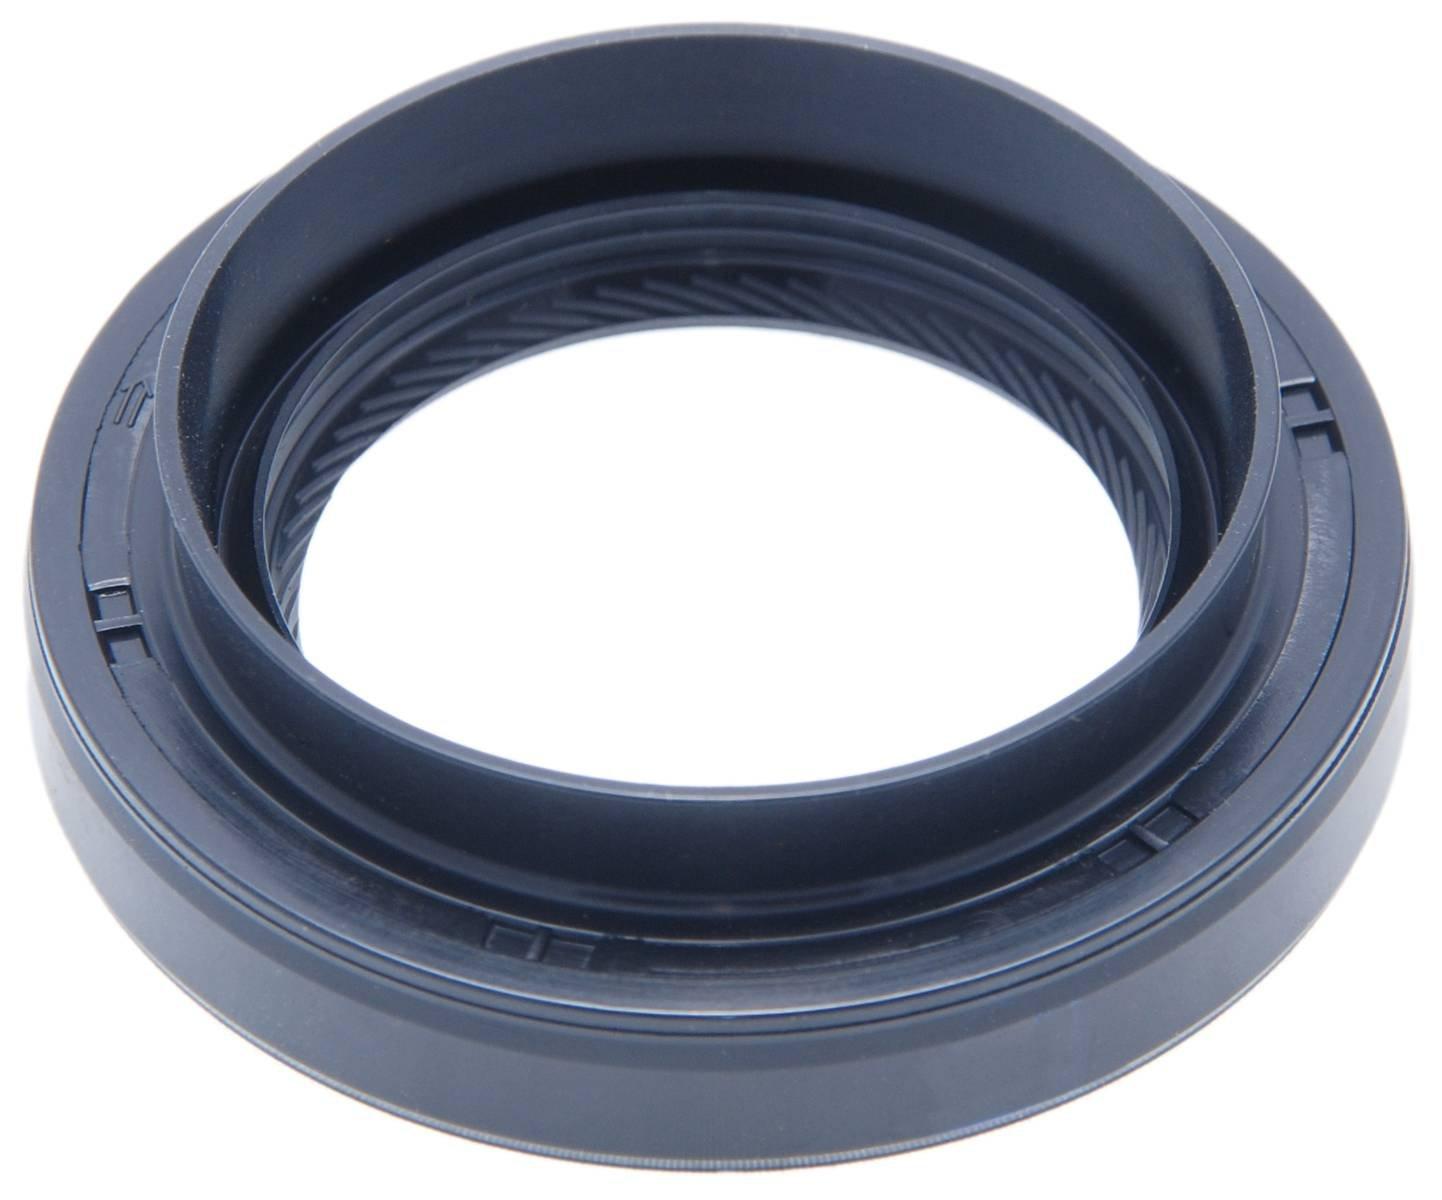 Toyota - Oil Seal (Axle Case) (35X54X9X16) - Oem: 90311-34016